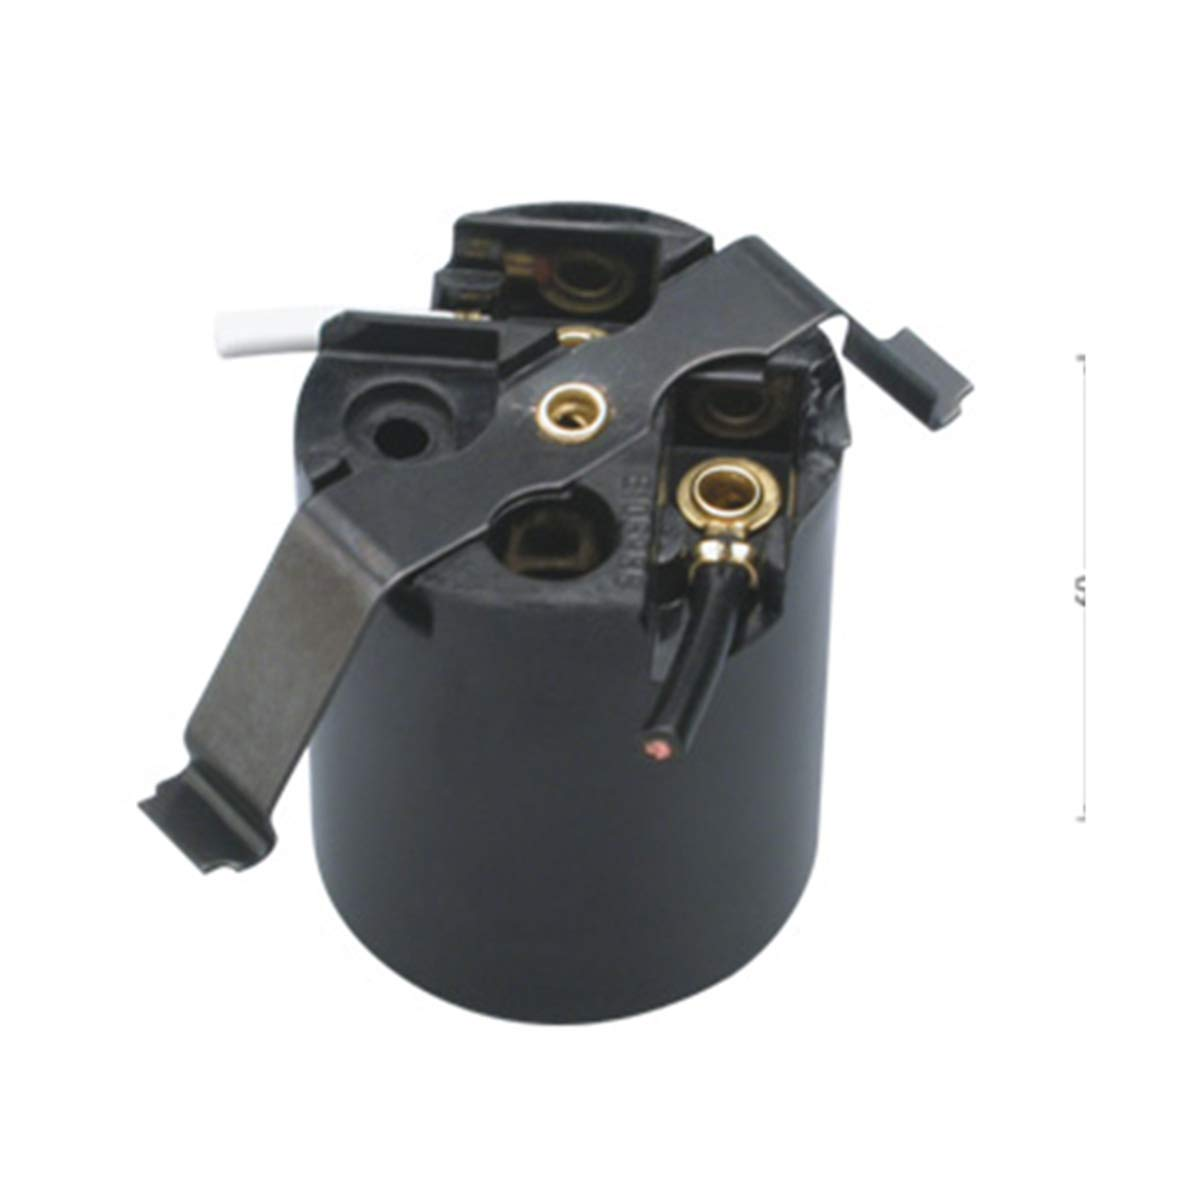 TWDRTTD Phenolic (Bakelite) Medium Base E26 Fixture Socket, US Standard Lamp Holder for E26 Edison Screw led, Incandescent Bulbs, One-Piece Keyless with Butterfly clip, Black (3 PACK)